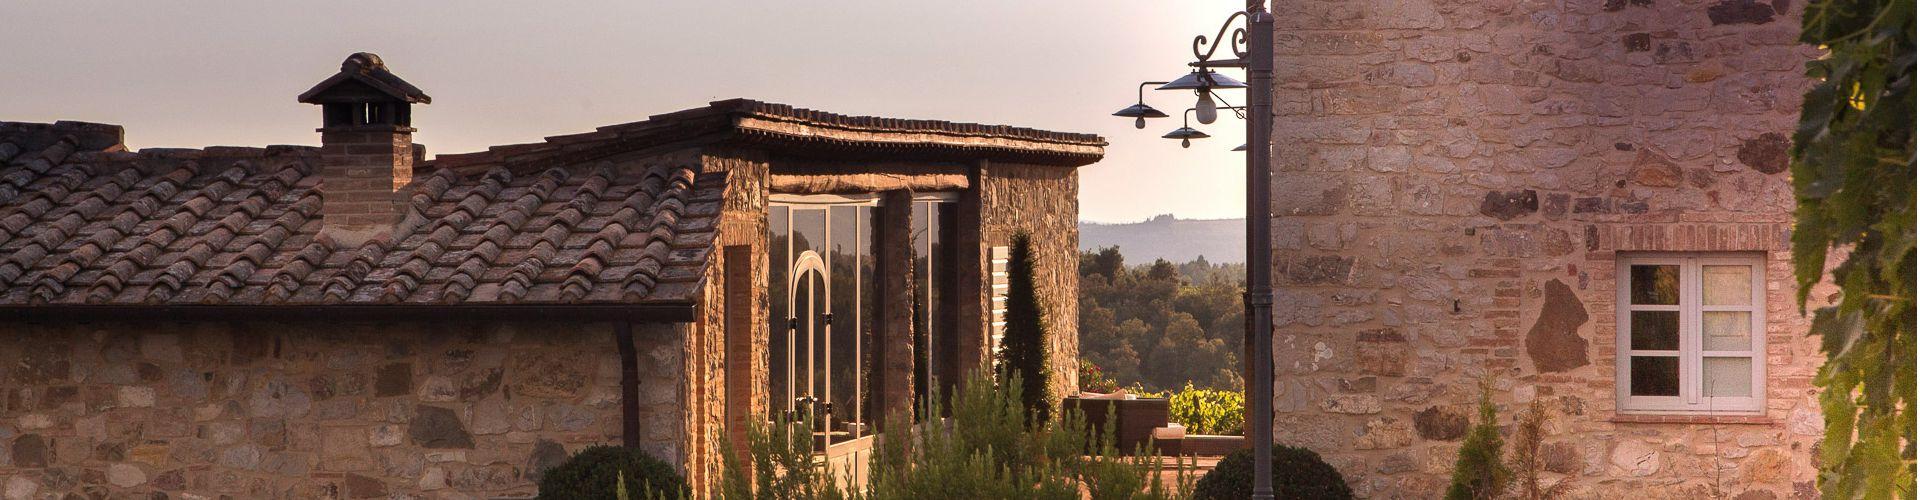 Best Tuscany Travel Agencies